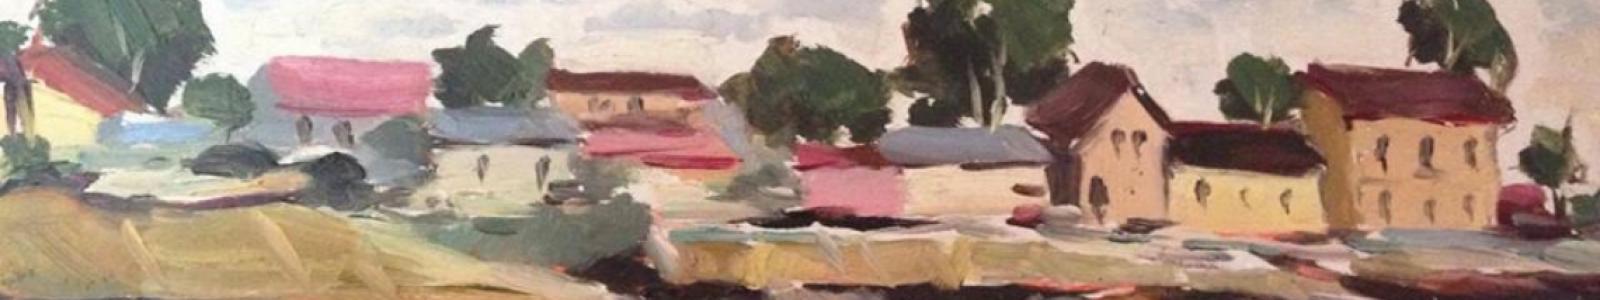 Gallery Painter David Lursmanashvili